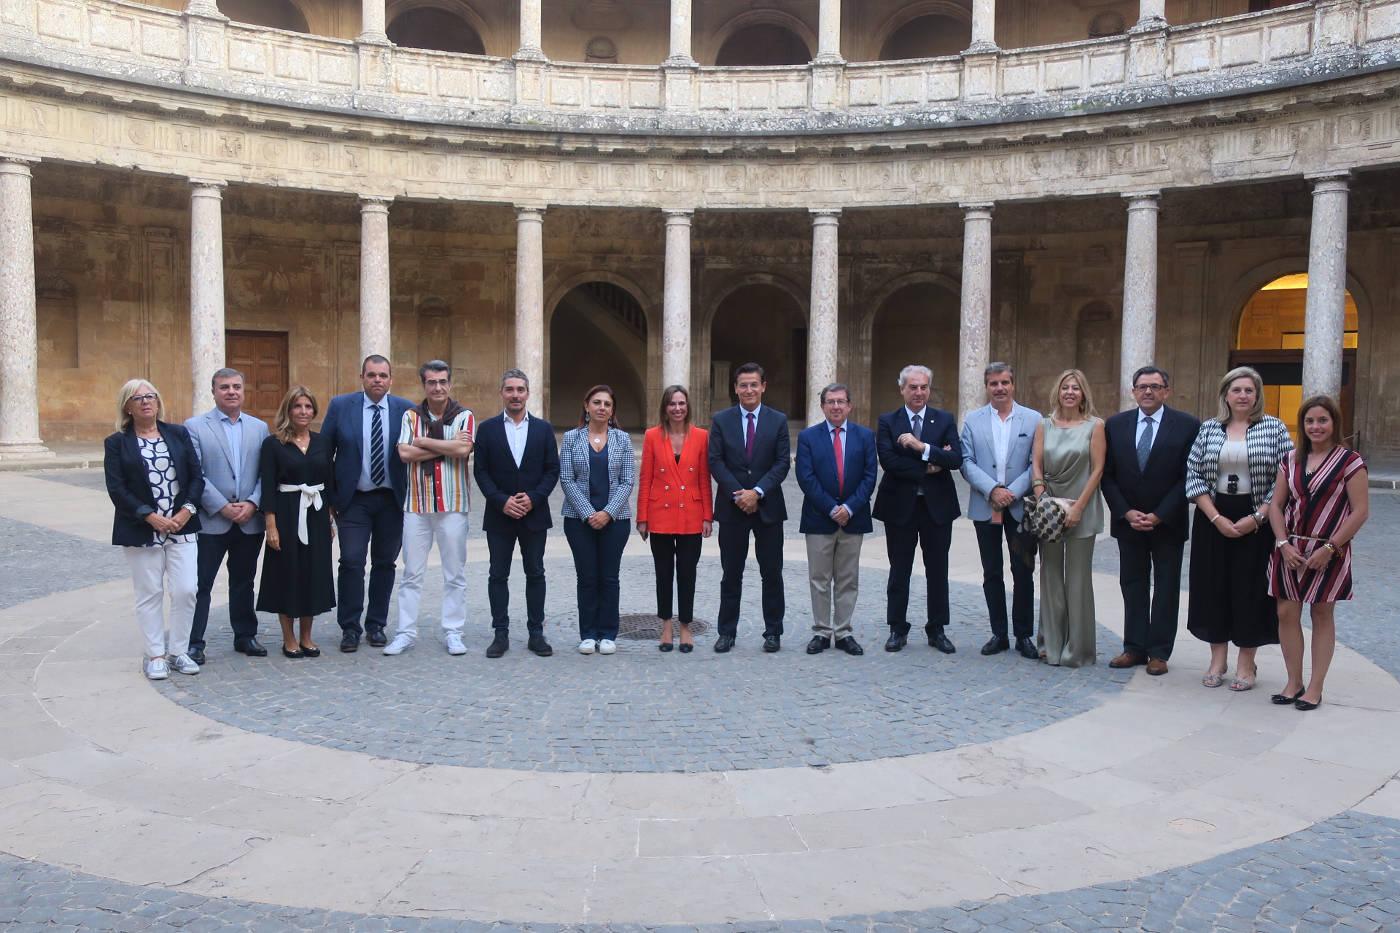 Visita institucional a la Alhambra